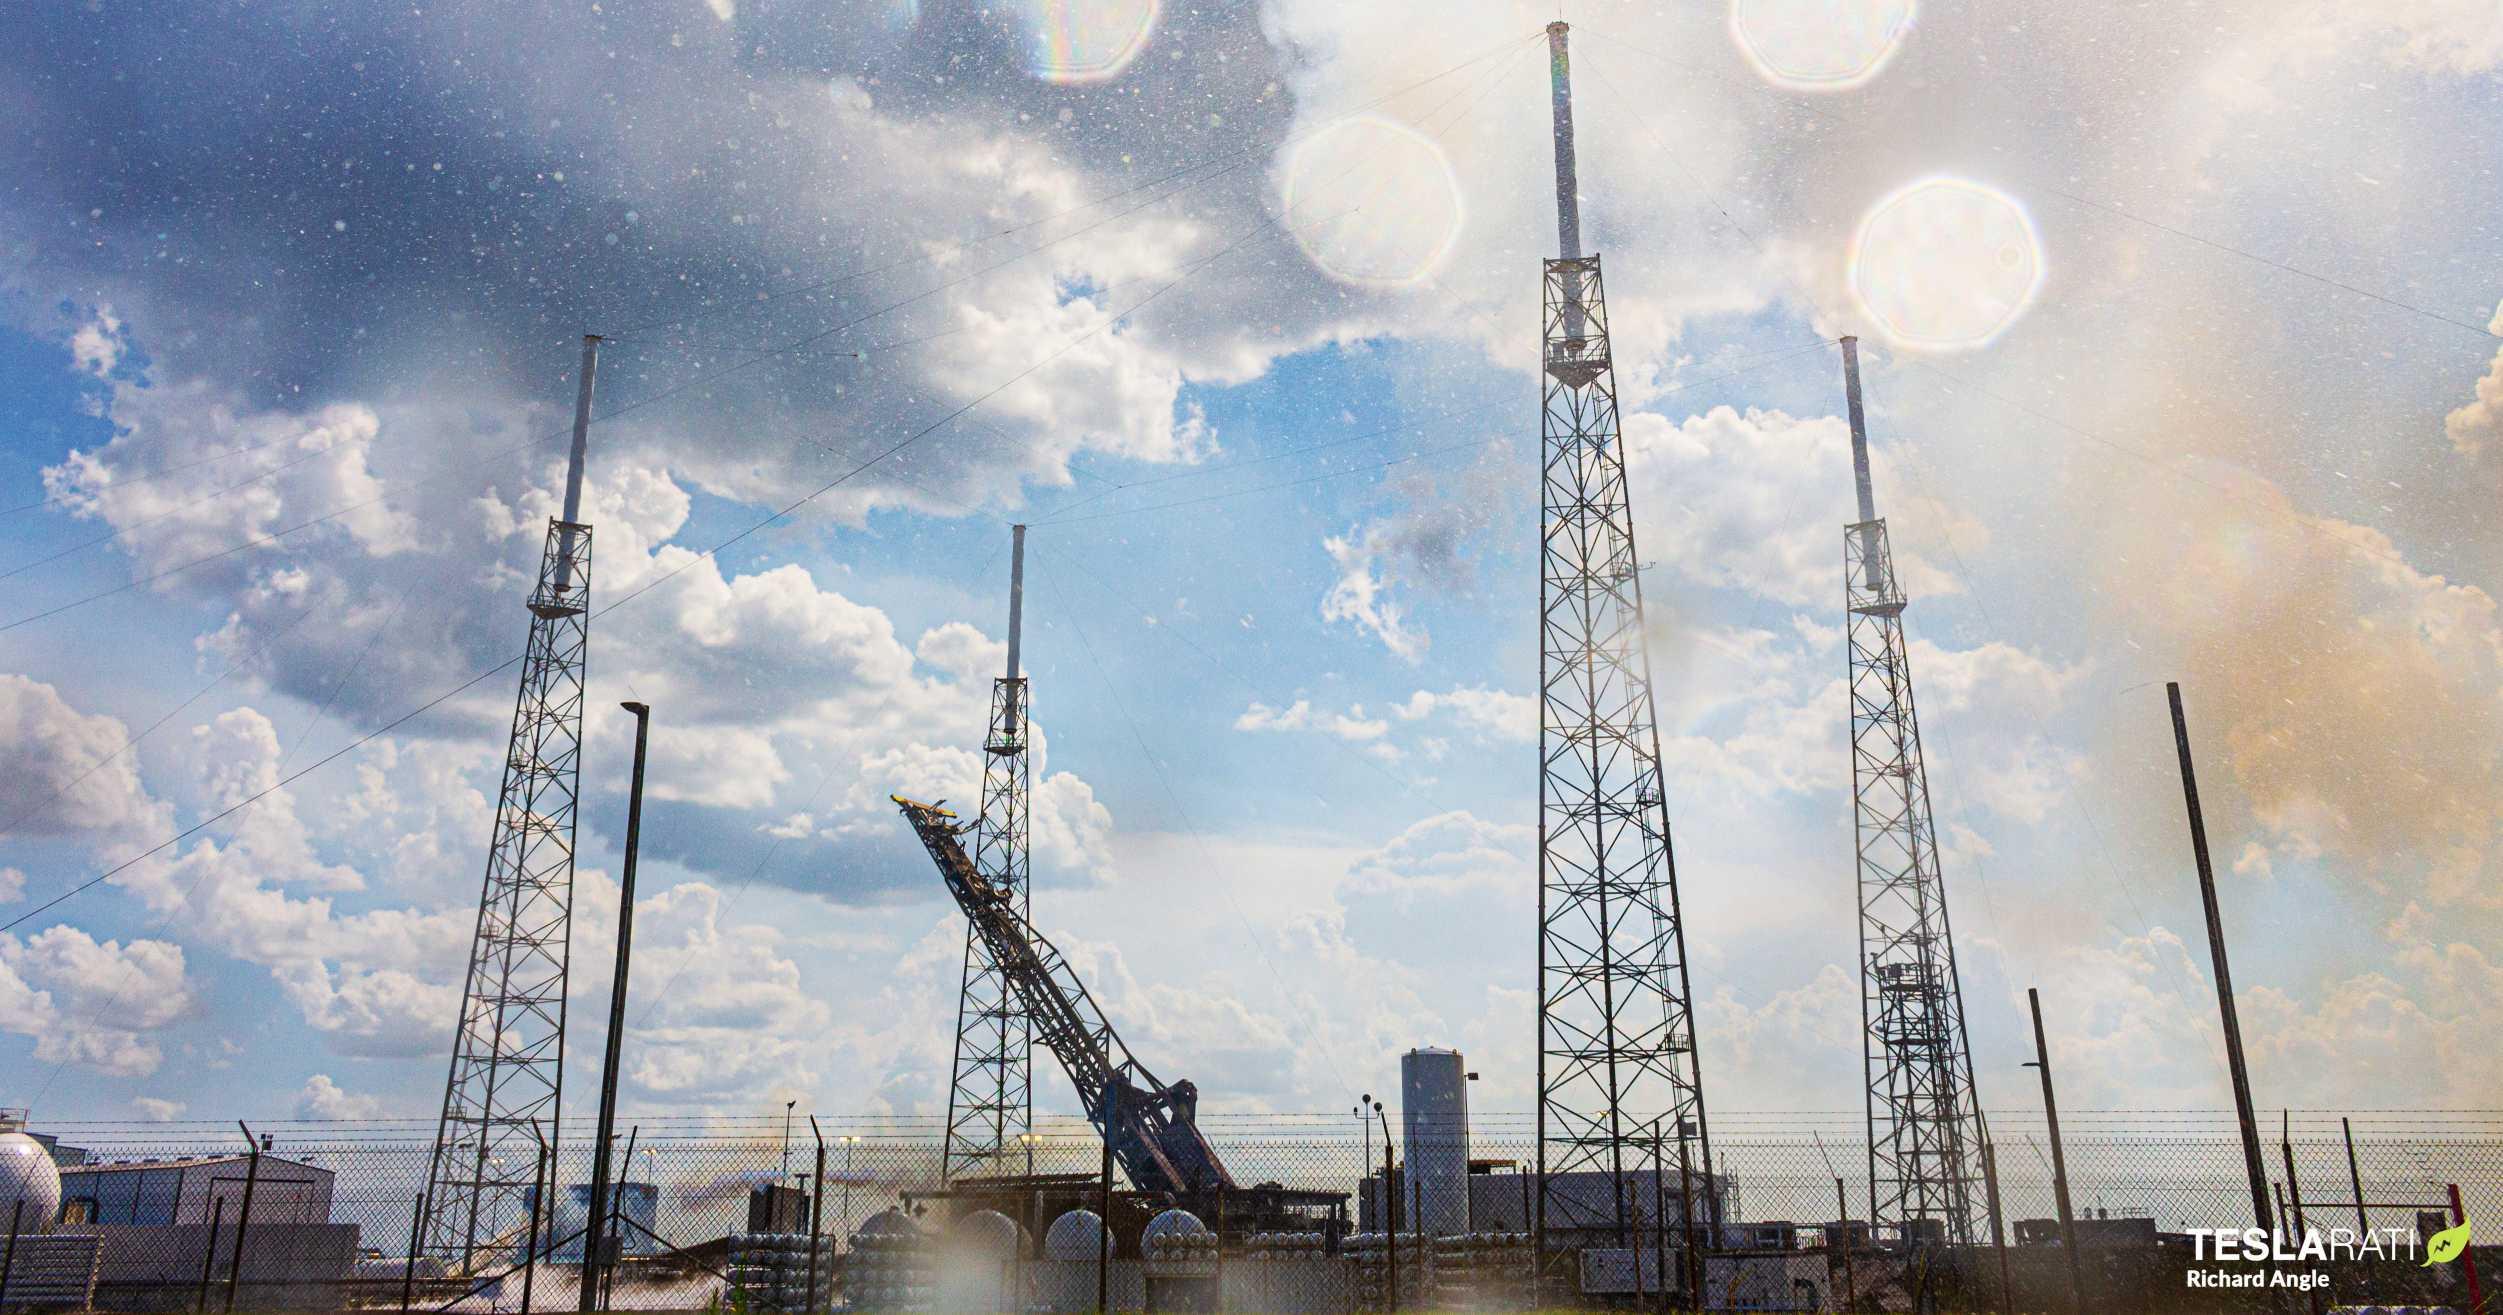 GPS III SV03 Falcon 9 B1060 063020 (Richard Angle) launch 9 crop edit (c)